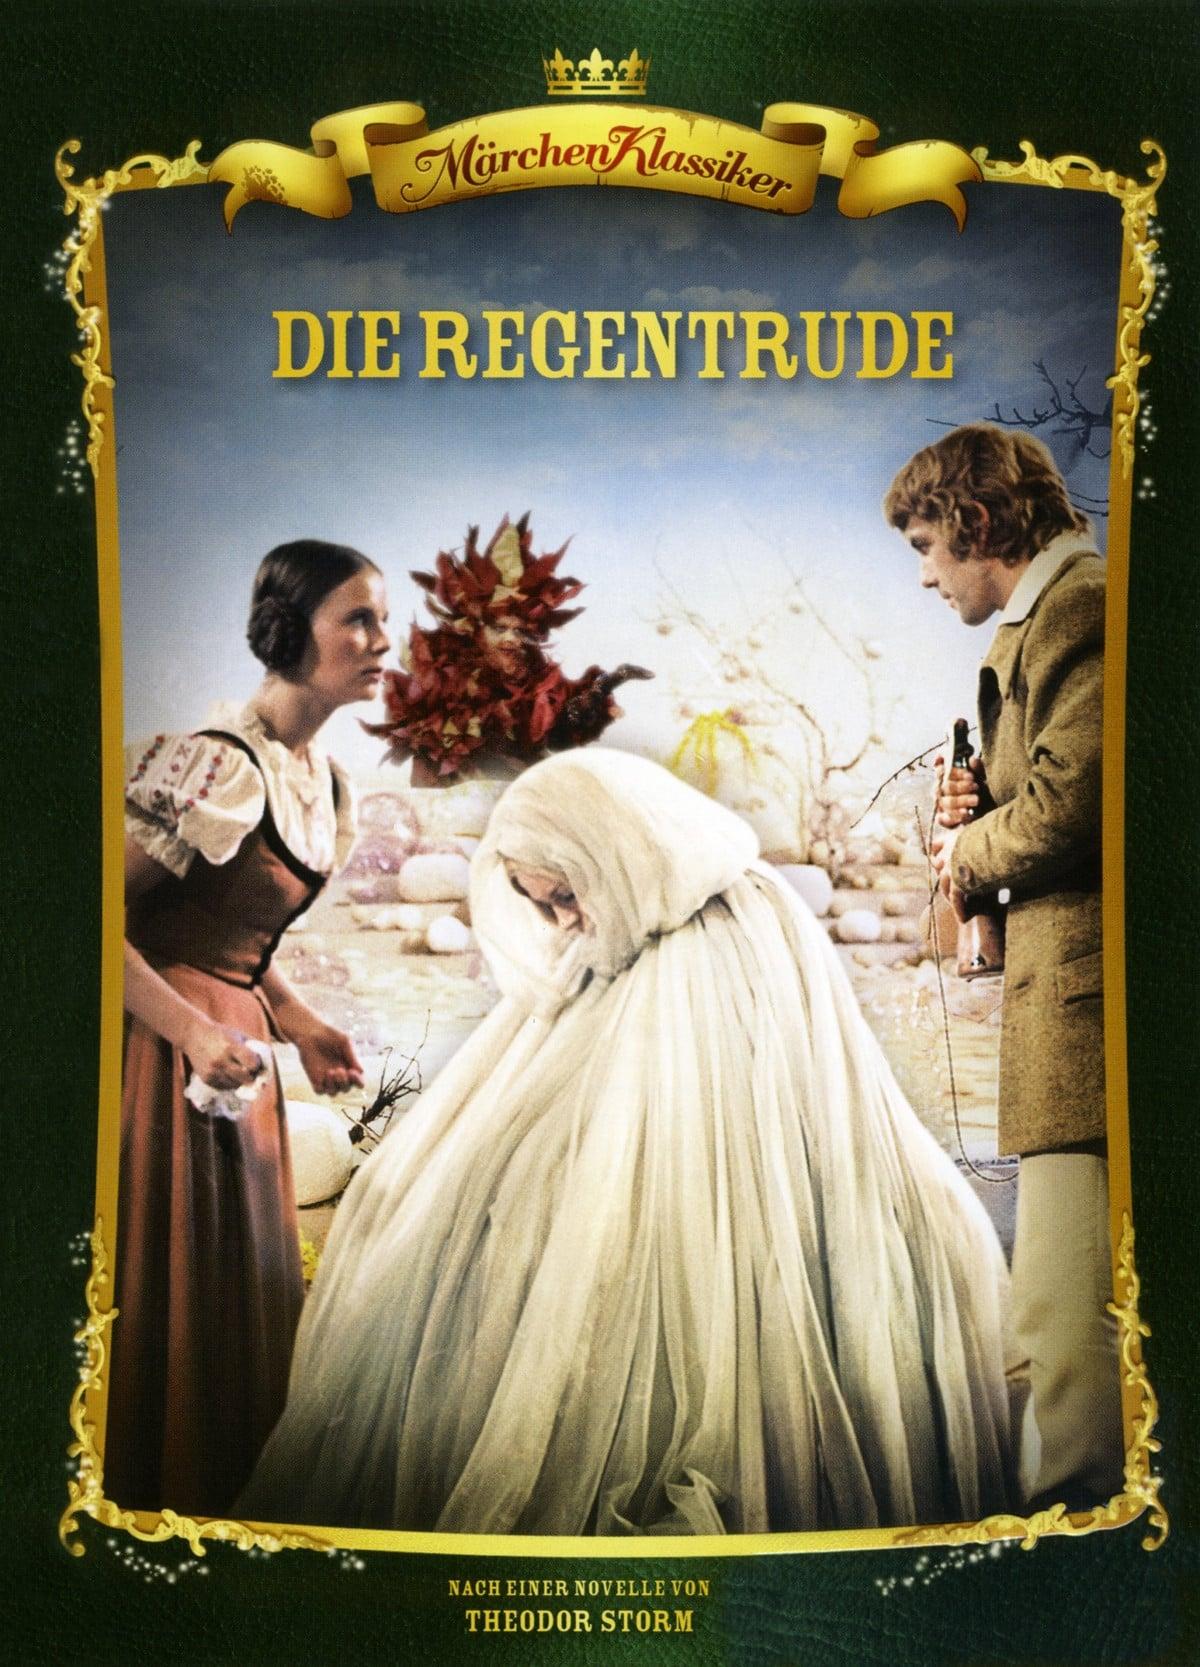 Die Regentrude Film